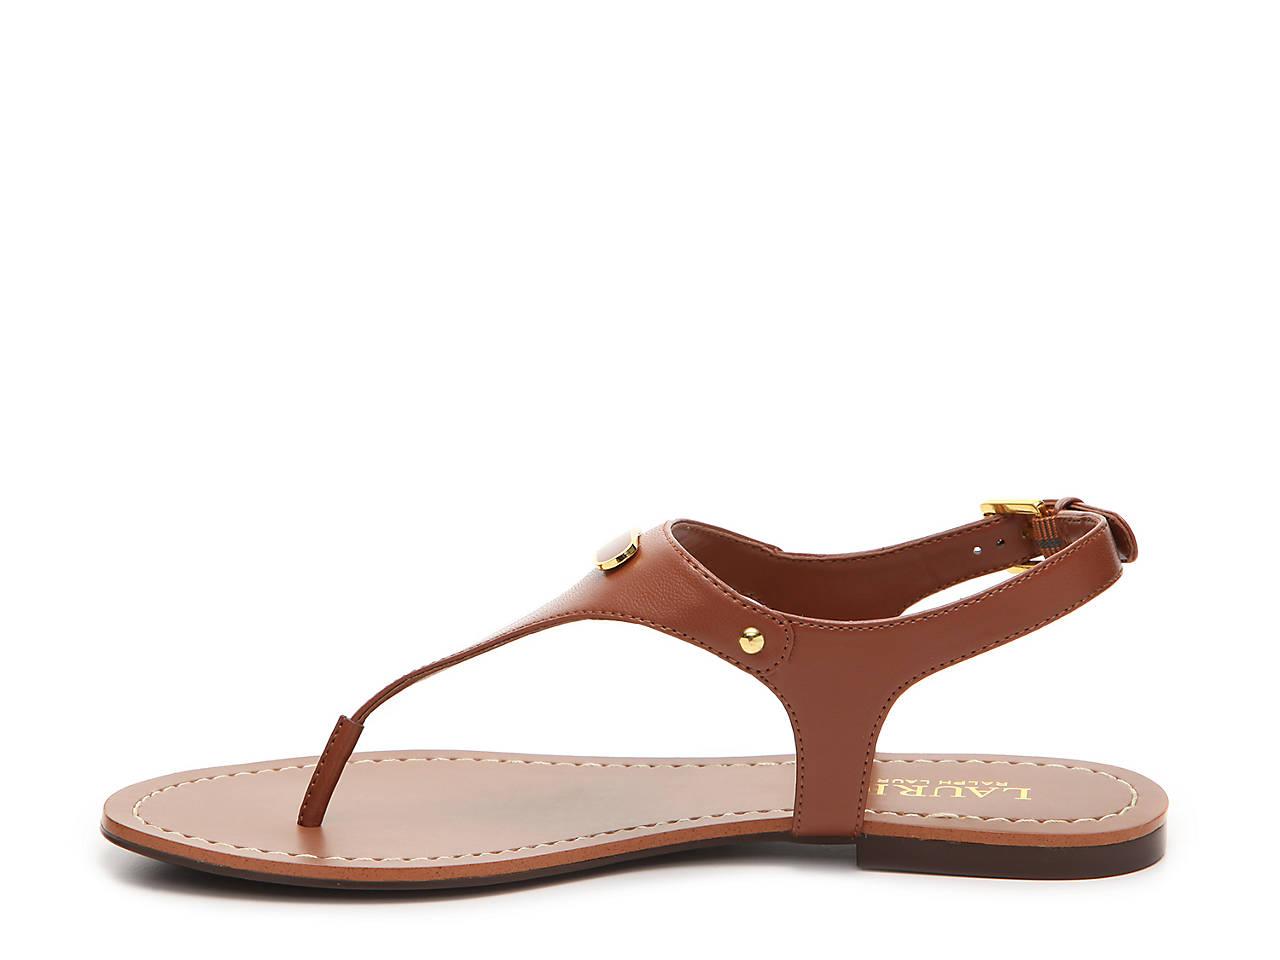 fcacc3d7f4dd0 ... Gold special sales 36e3d  Lauren Ralph Lauren Patsi Flat Sandal Women s  Shoes DSW high quality 63071 2dfe4  Amazing Shopping Savings G by Guess  Tunez ...